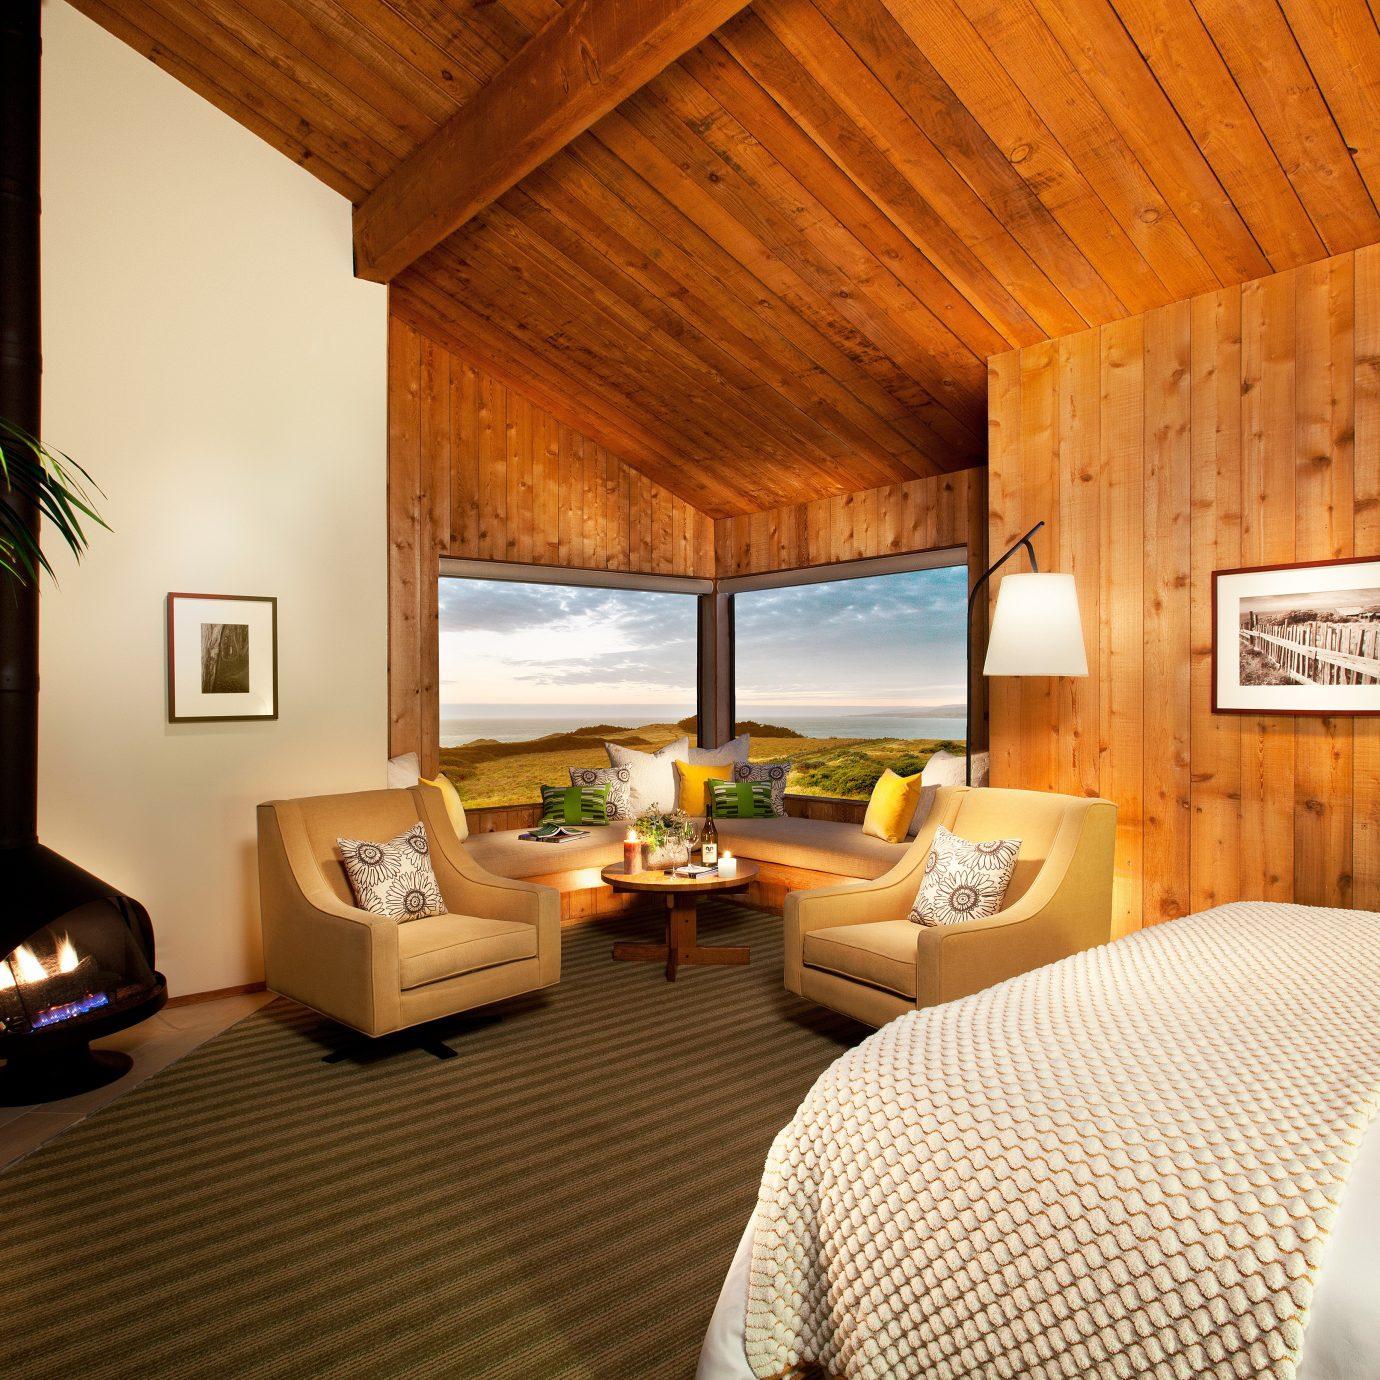 Bedroom Modern Resort Rustic property cottage home living room Villa Suite farmhouse